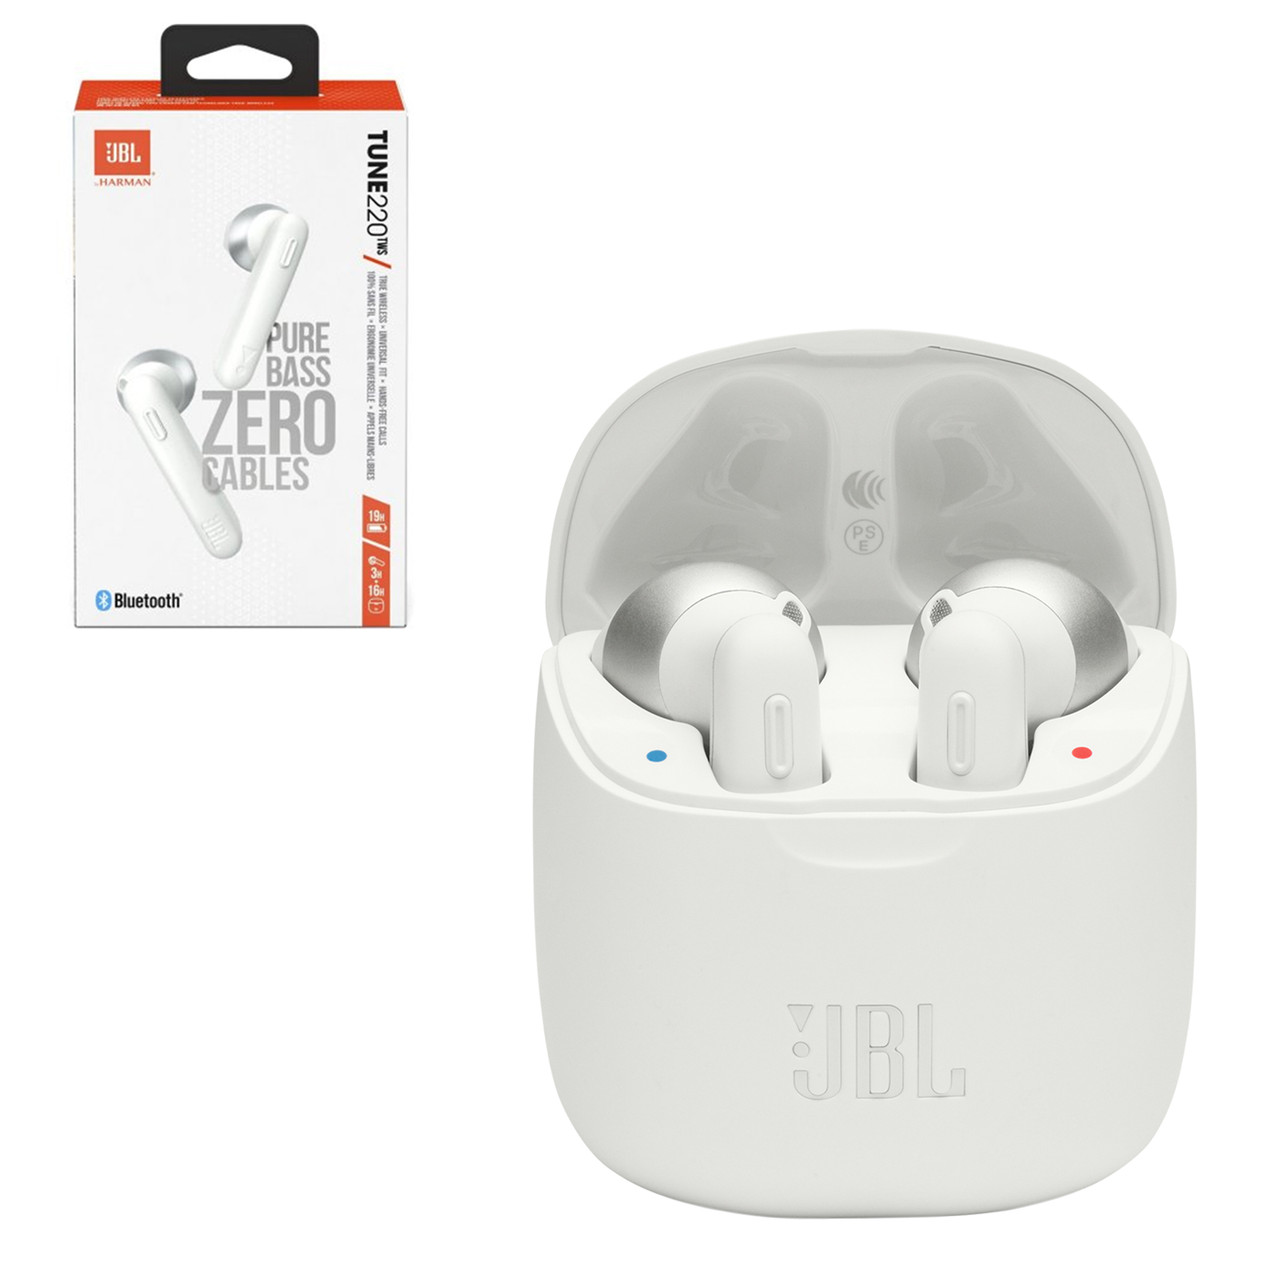 Bluetooth гарнитура JBL Tune220TWS Pure Bass Zero Cables, White